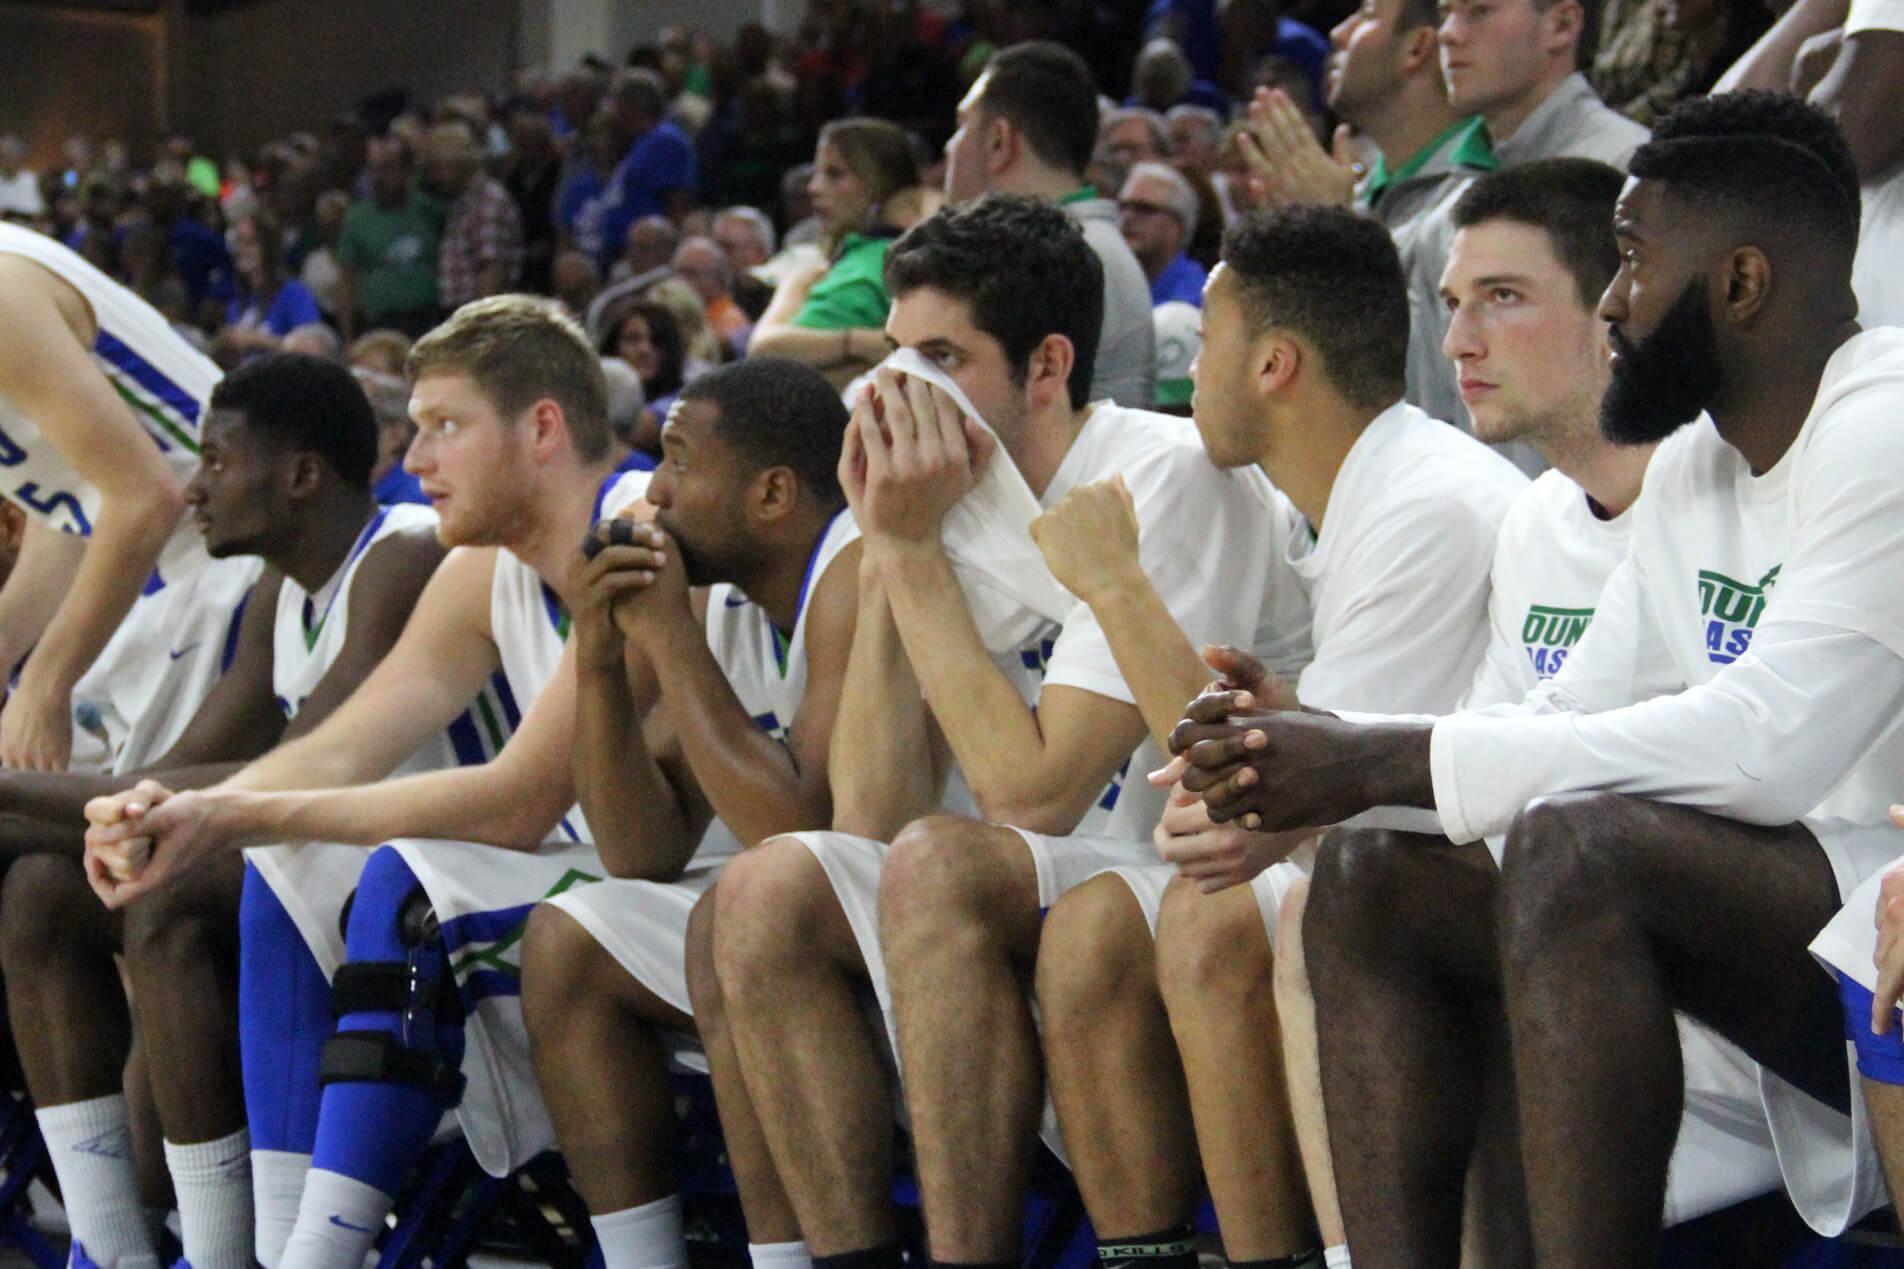 FGCU loses heartbreaker to USC Upstate